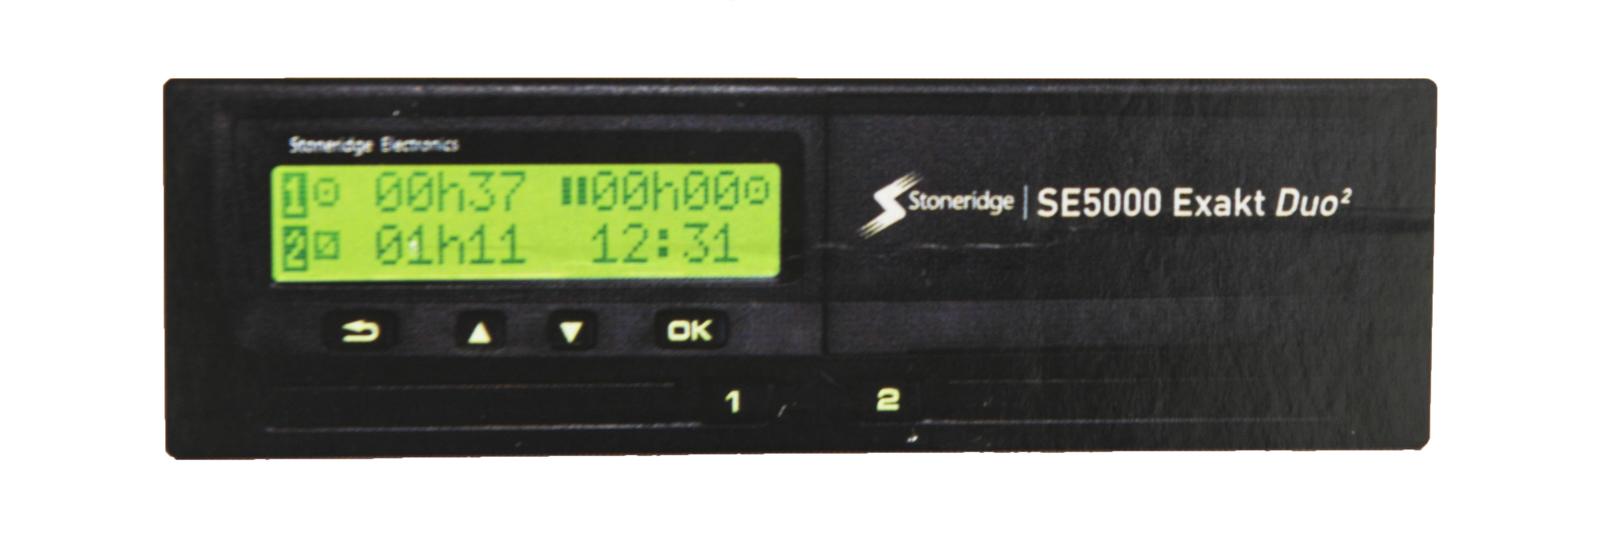 hgv tachograph services vdo stoneridge agents rh tacho fit co uk stoneridge digital tachograph manual entries DVLA Digital Tachograph Card Lost